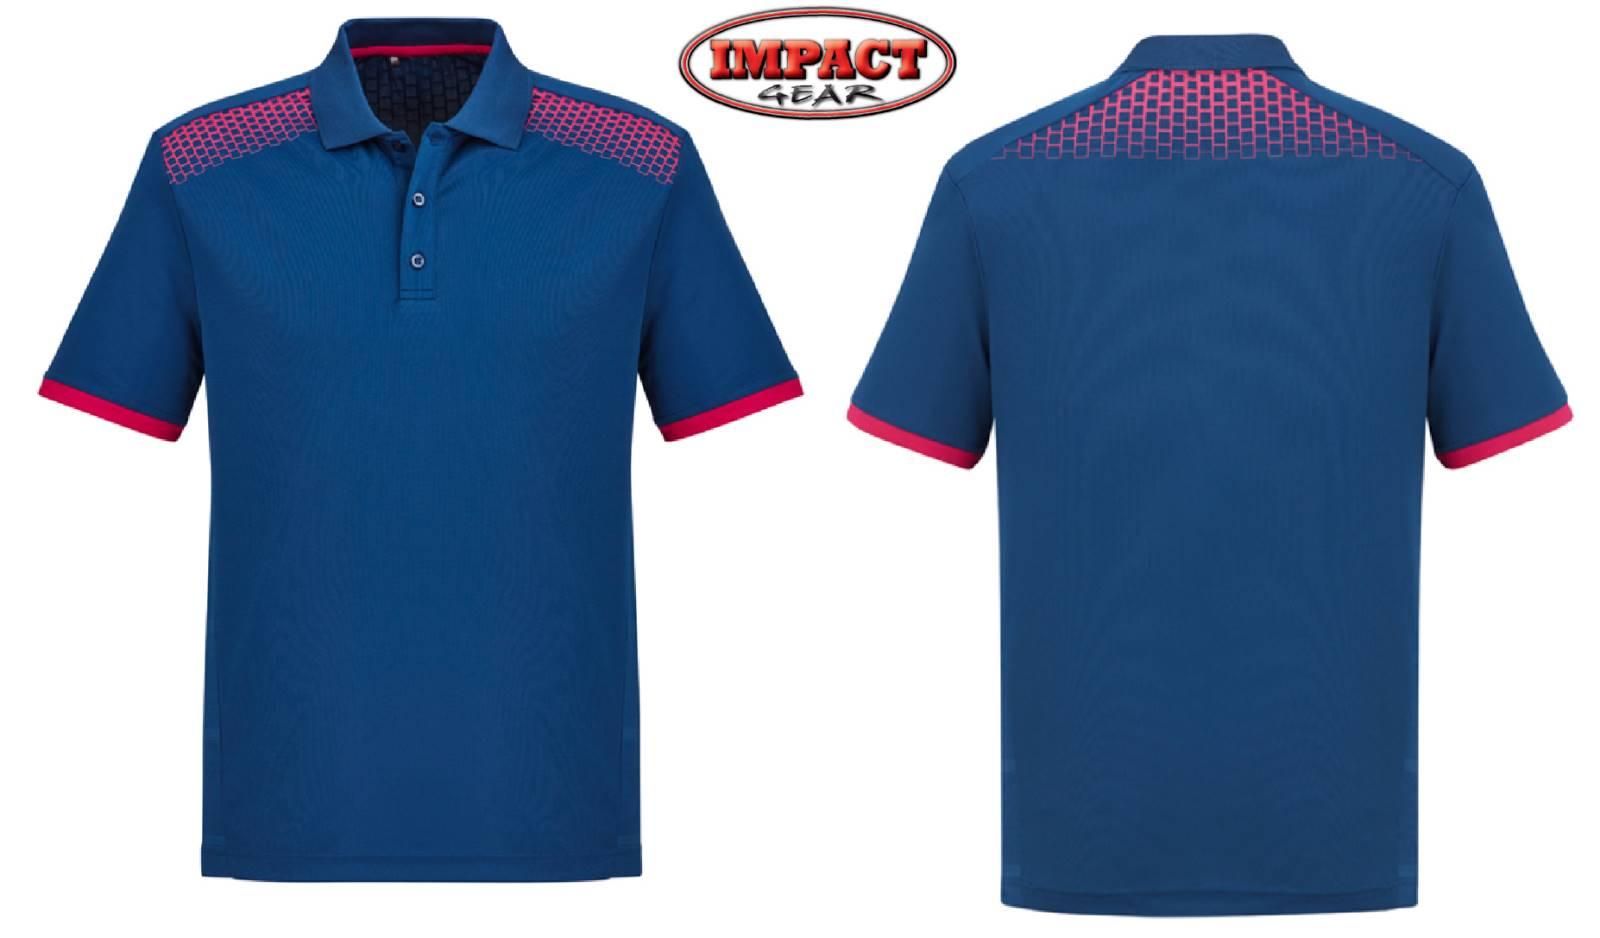 Steel Blue / Magenta Galaxy Polo shirts